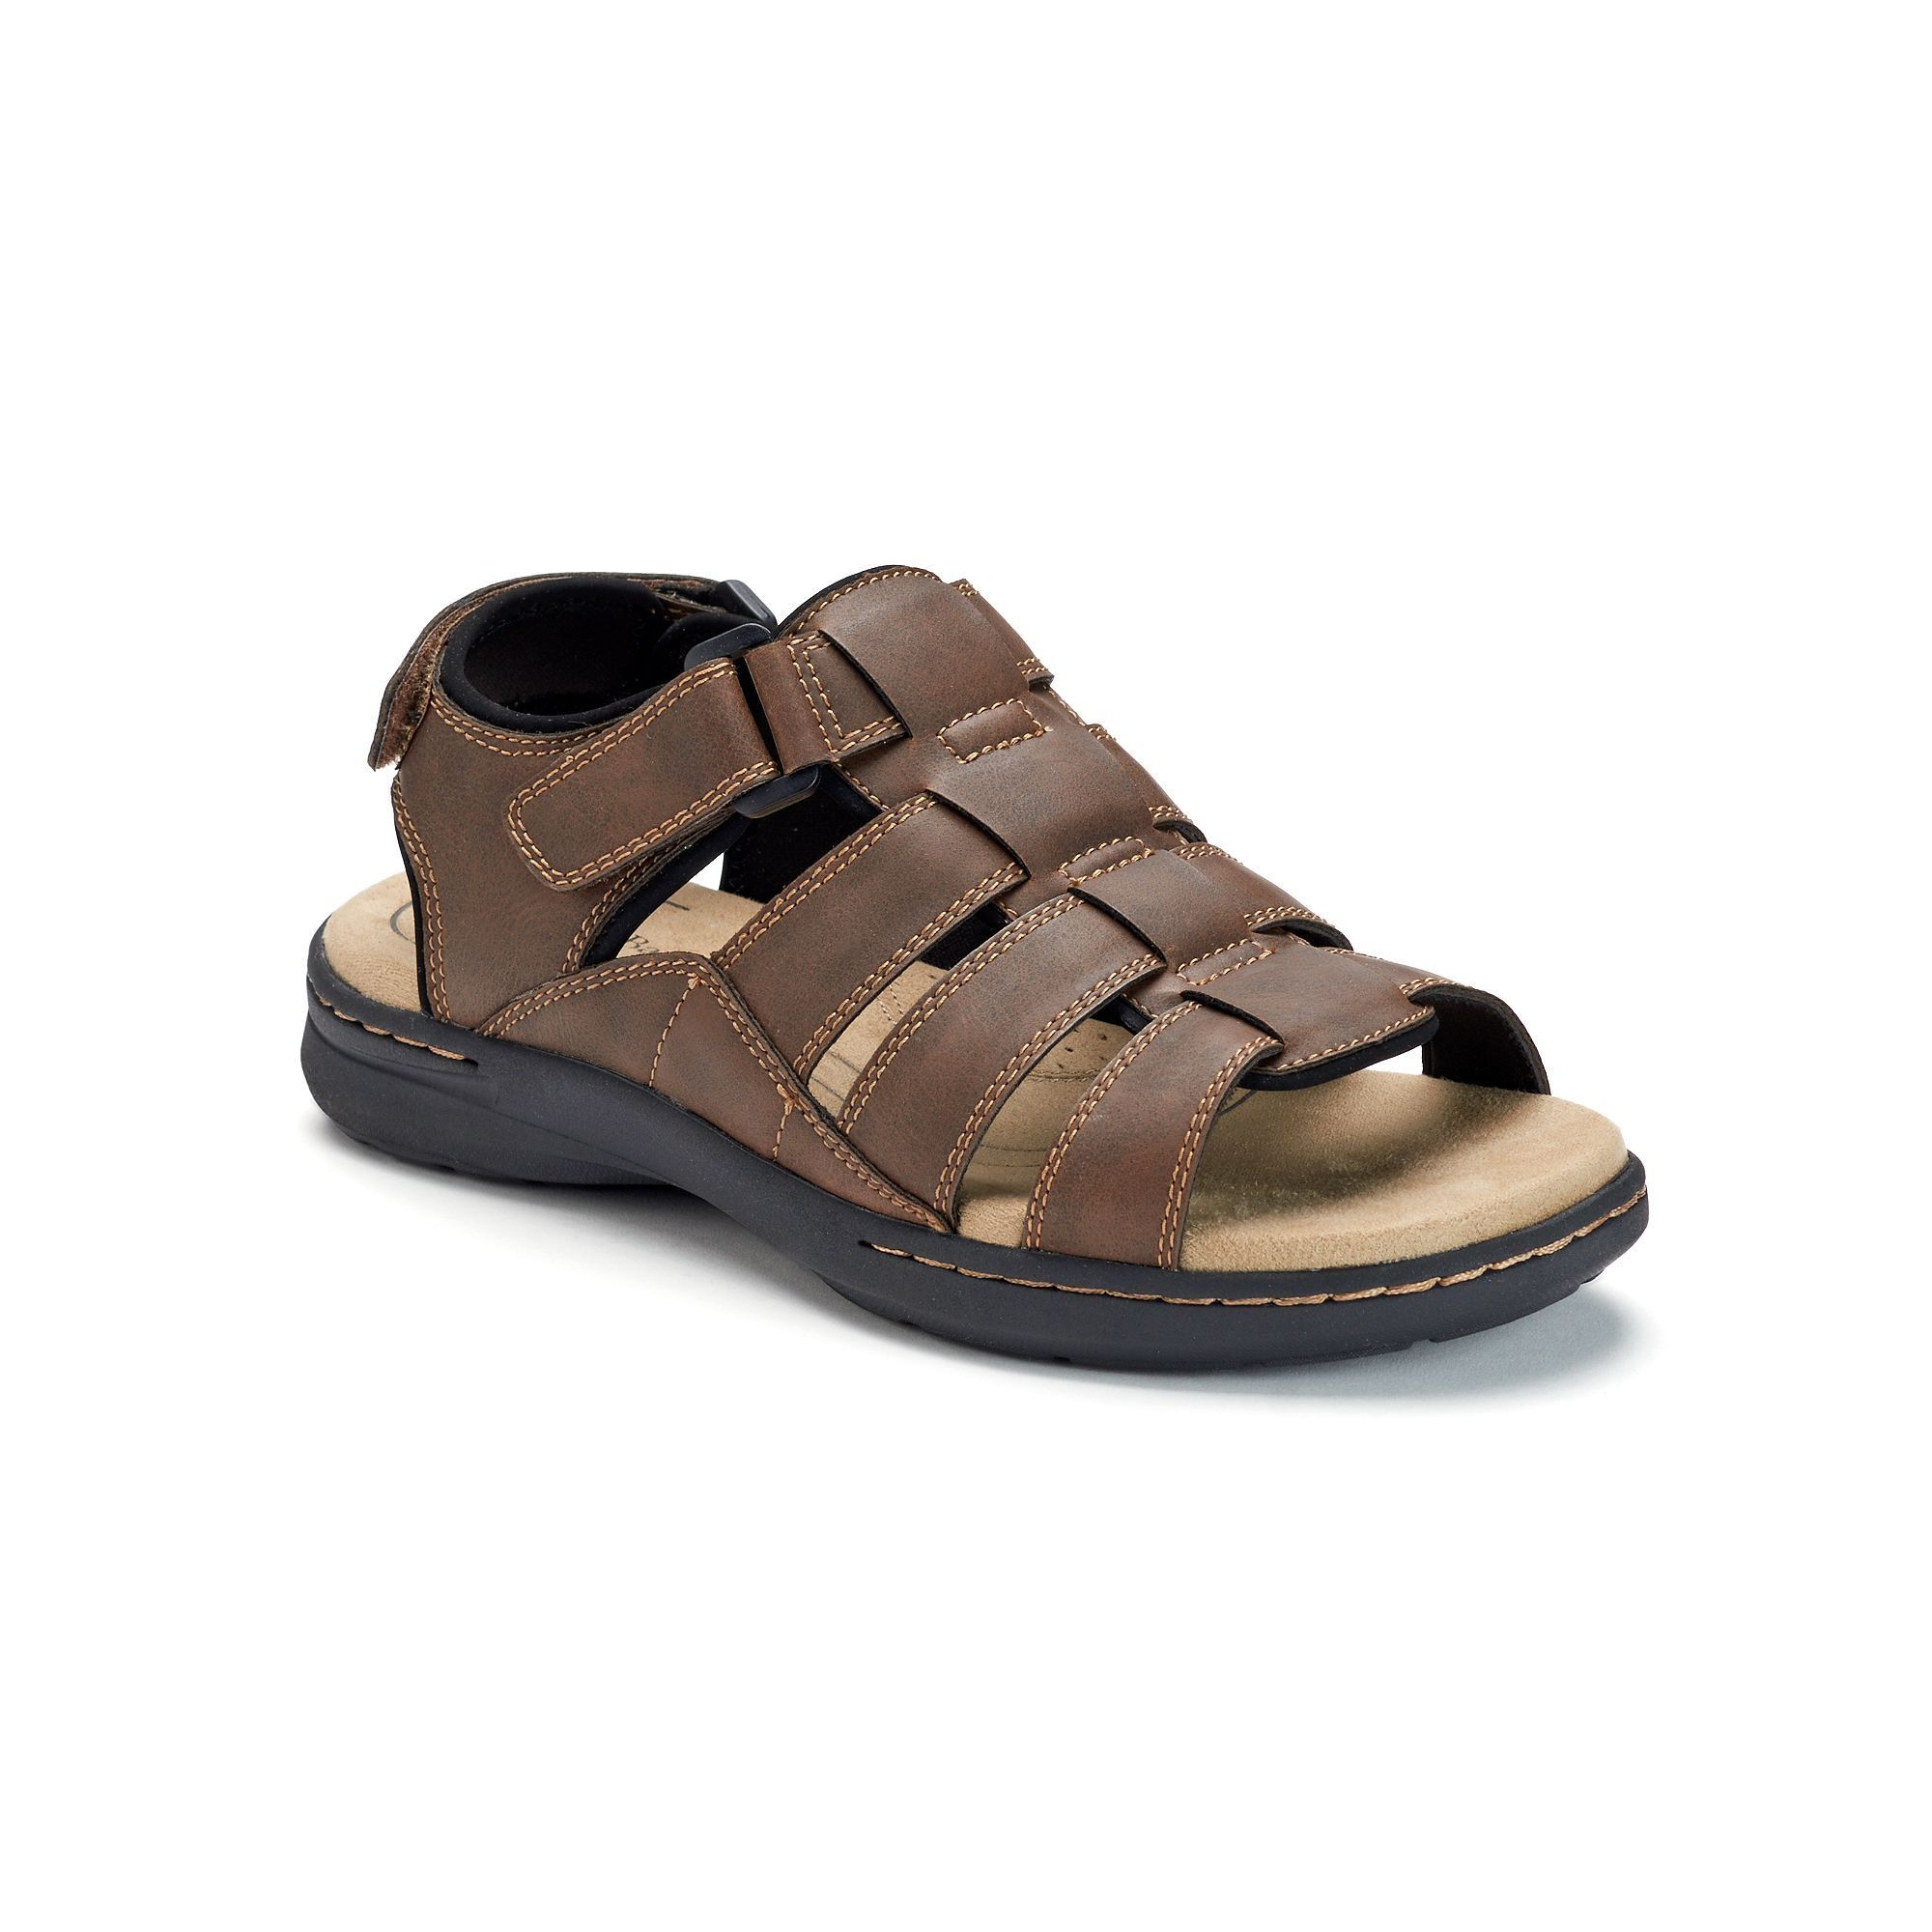 Barrow® Gary Men's Ortholite Sandals